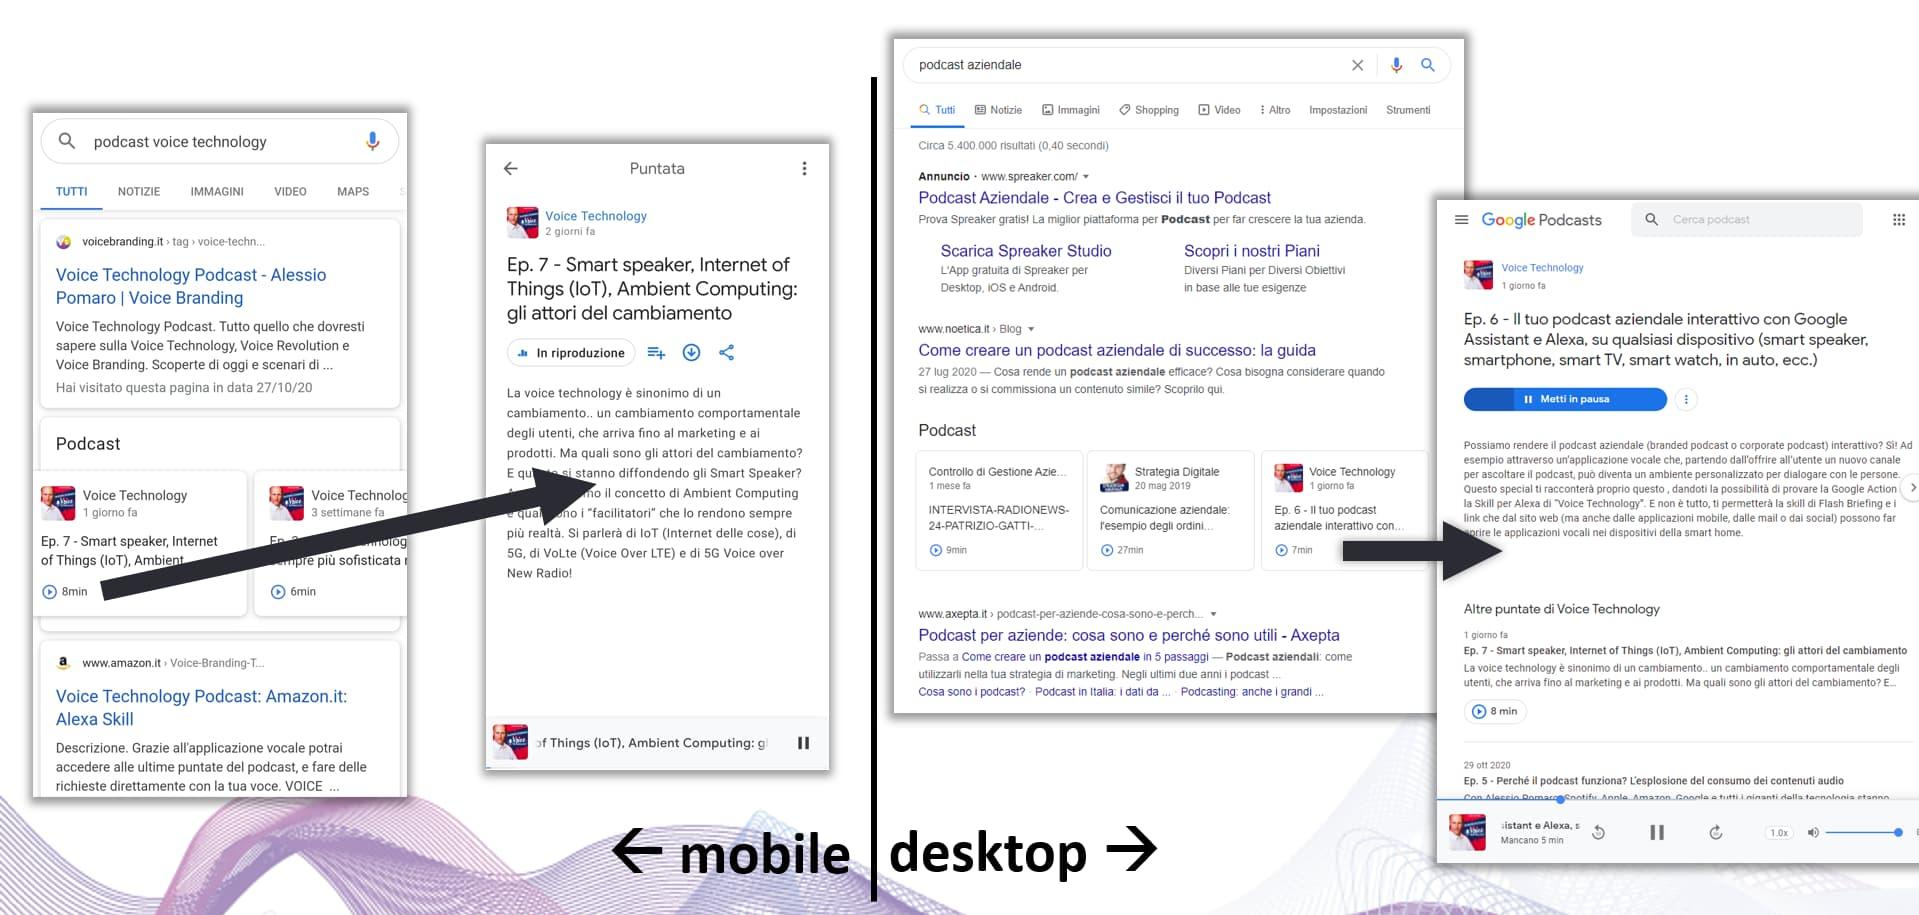 Dalla SERP a Google Podcasts (mobile e desktop)